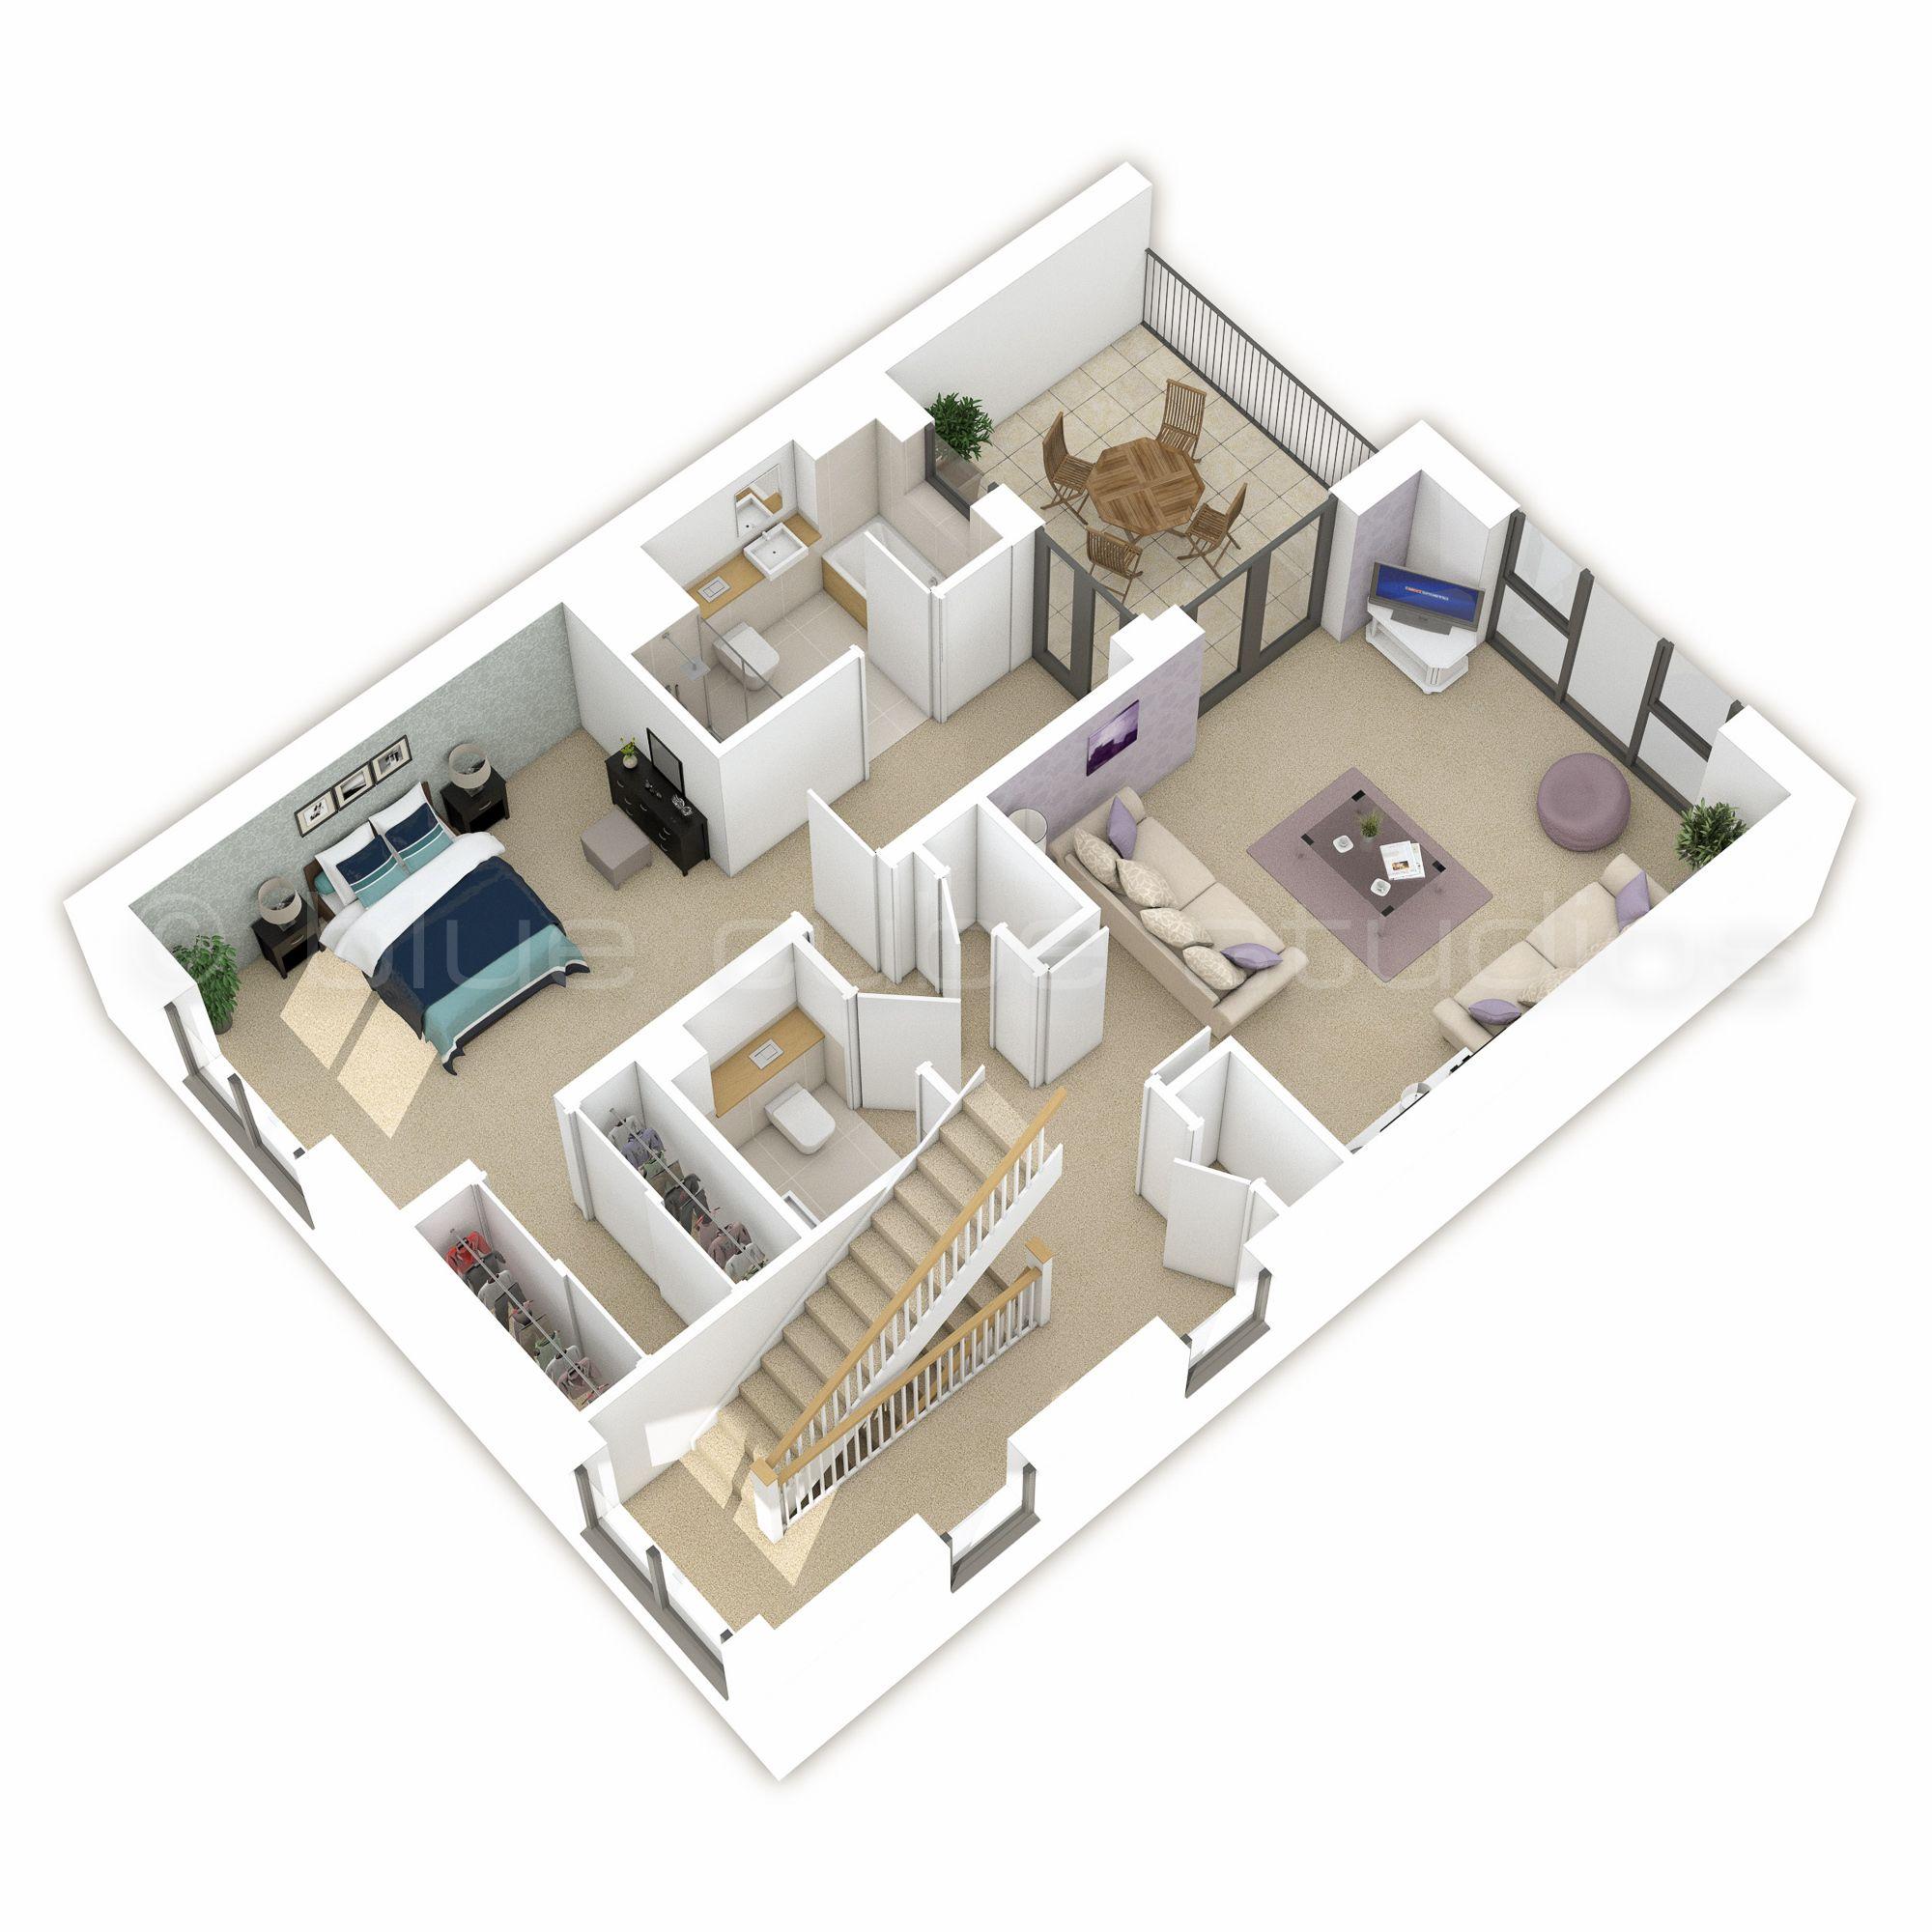 3D Floor Plans Blue Cube Studios Ltd Floor plans